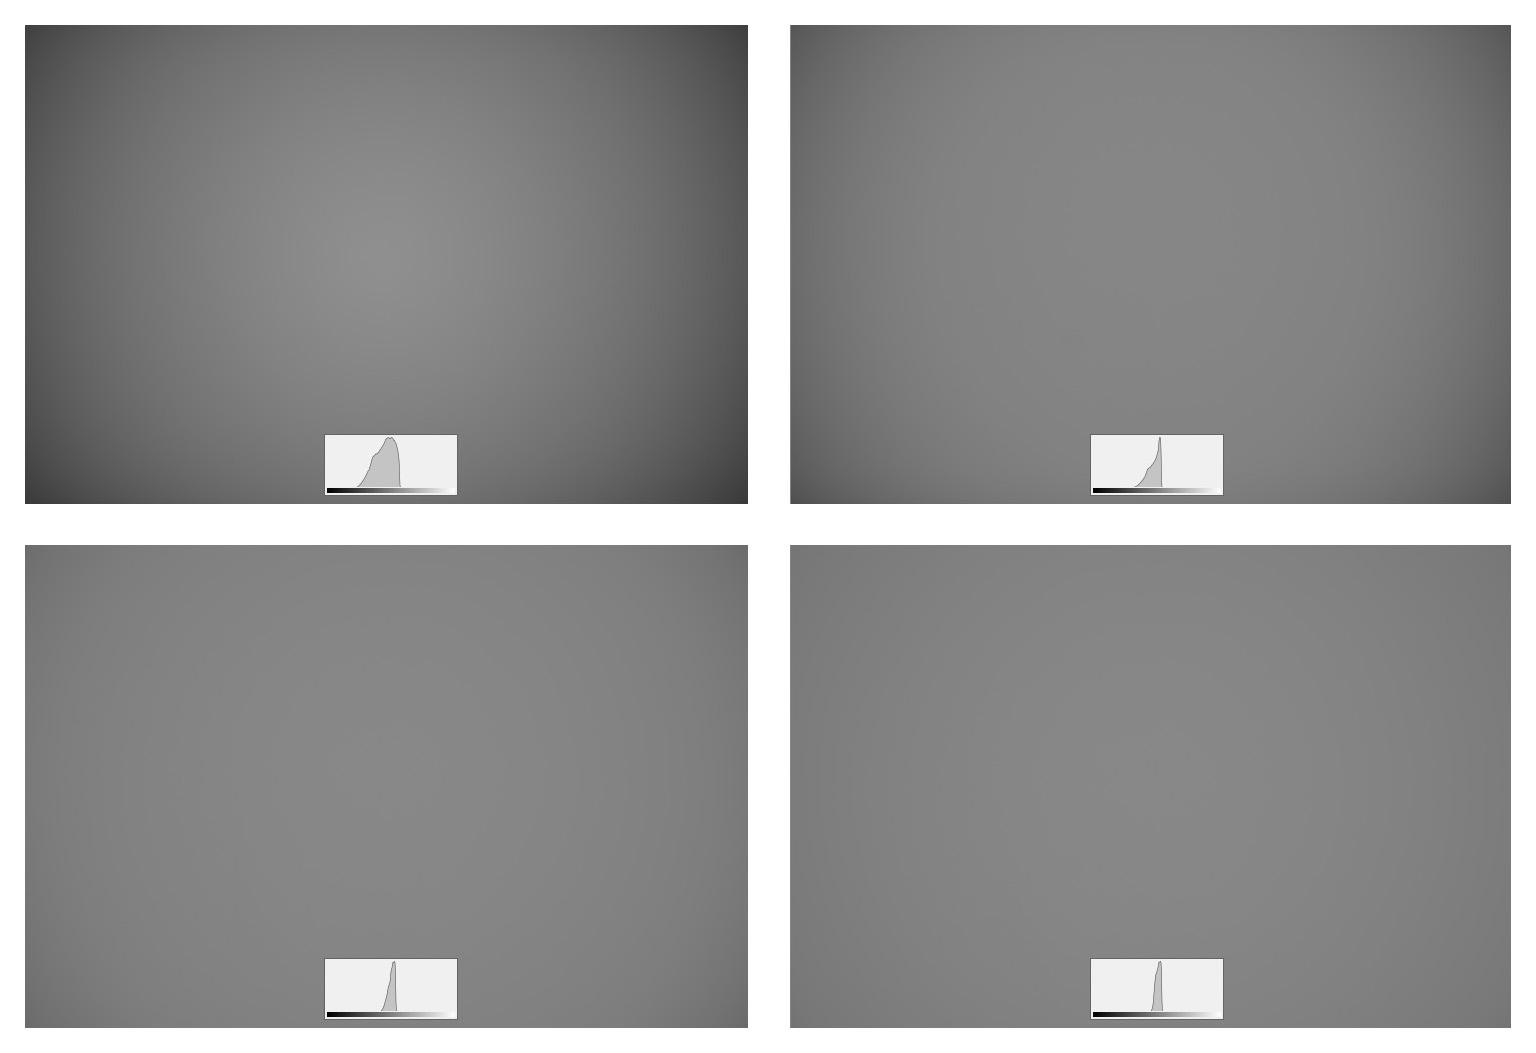 Vinětace objektivu AF-S Nikkor 28 mm f/1,4E ED. Clony F1,4; F2; F2,8 a F4